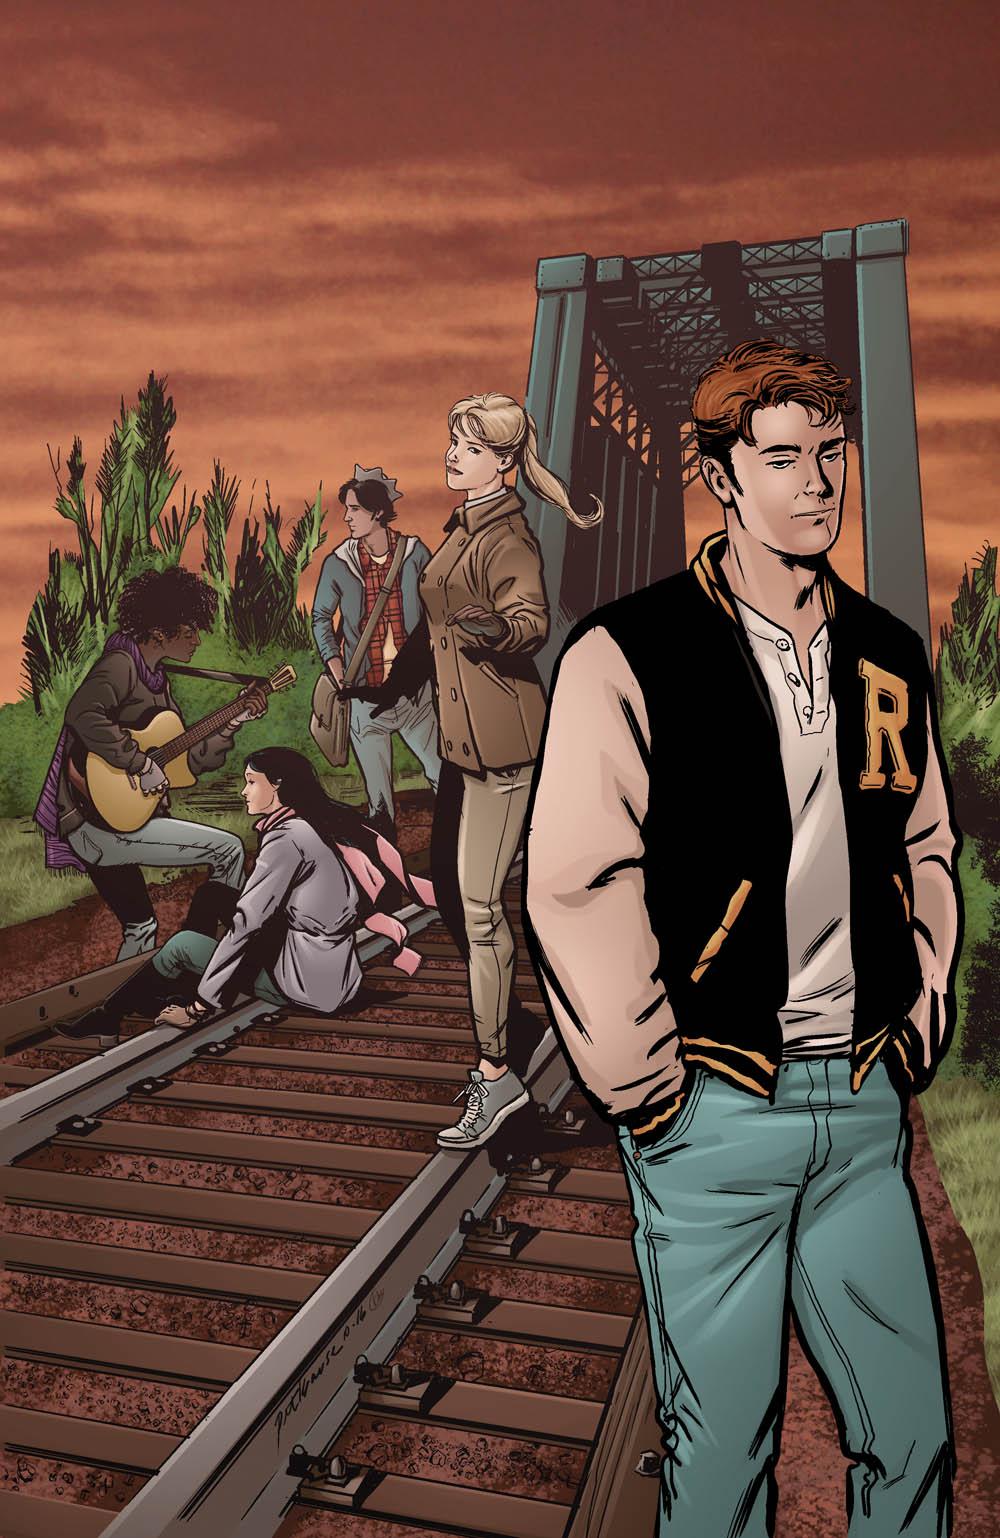 Riverdale 1 Krause Archie Comics